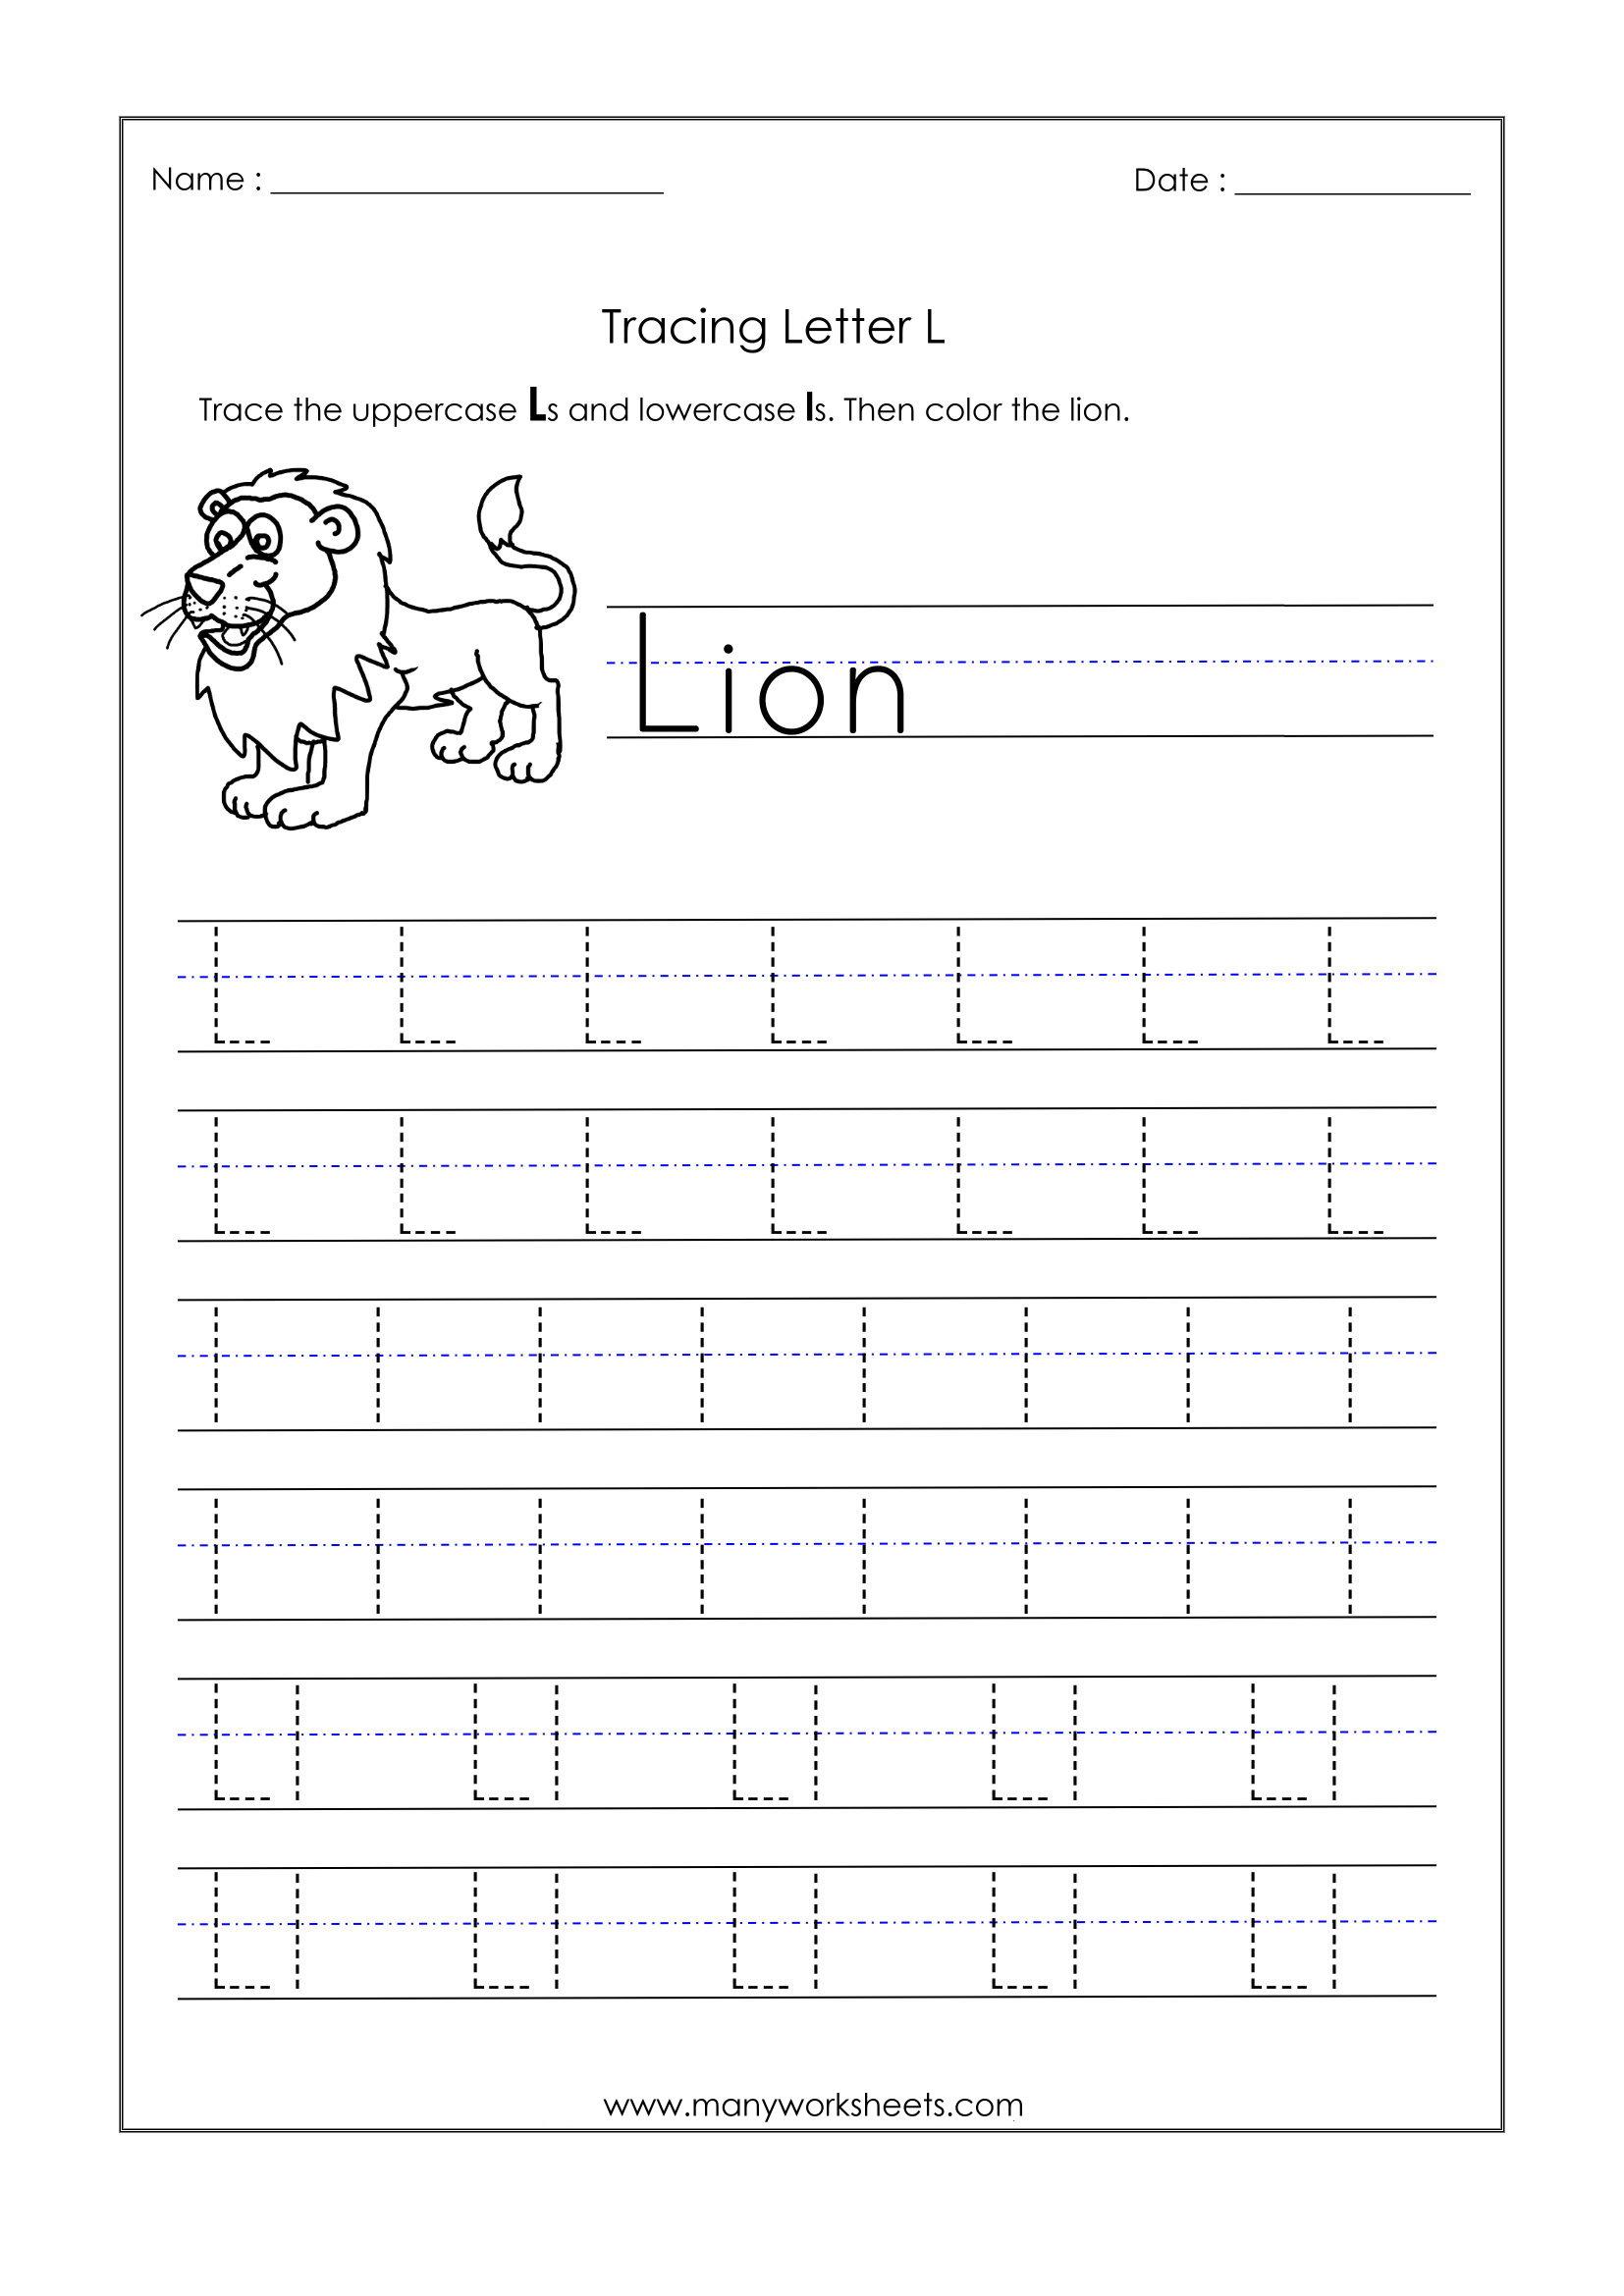 Letter L Worksheets For Kindergarten – Trace Dotted Letters intended for L Letter Tracing